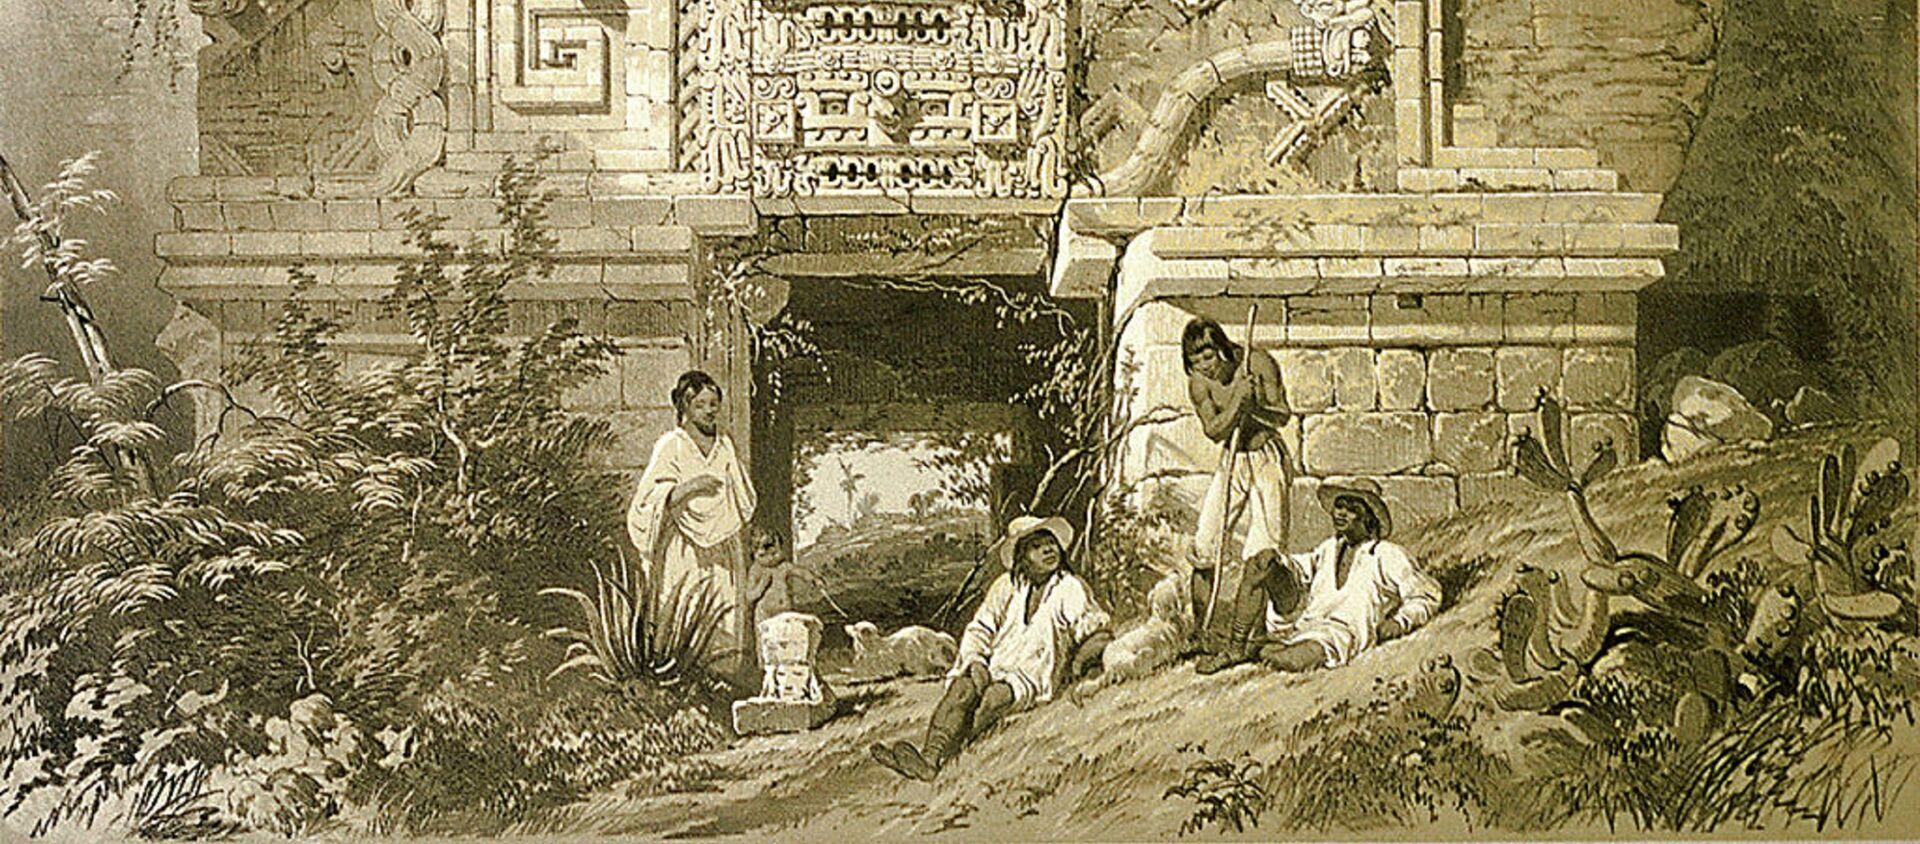 Un monumento de la cultura maya, imagen ilustrativa - Sputnik Mundo, 1920, 07.09.2020